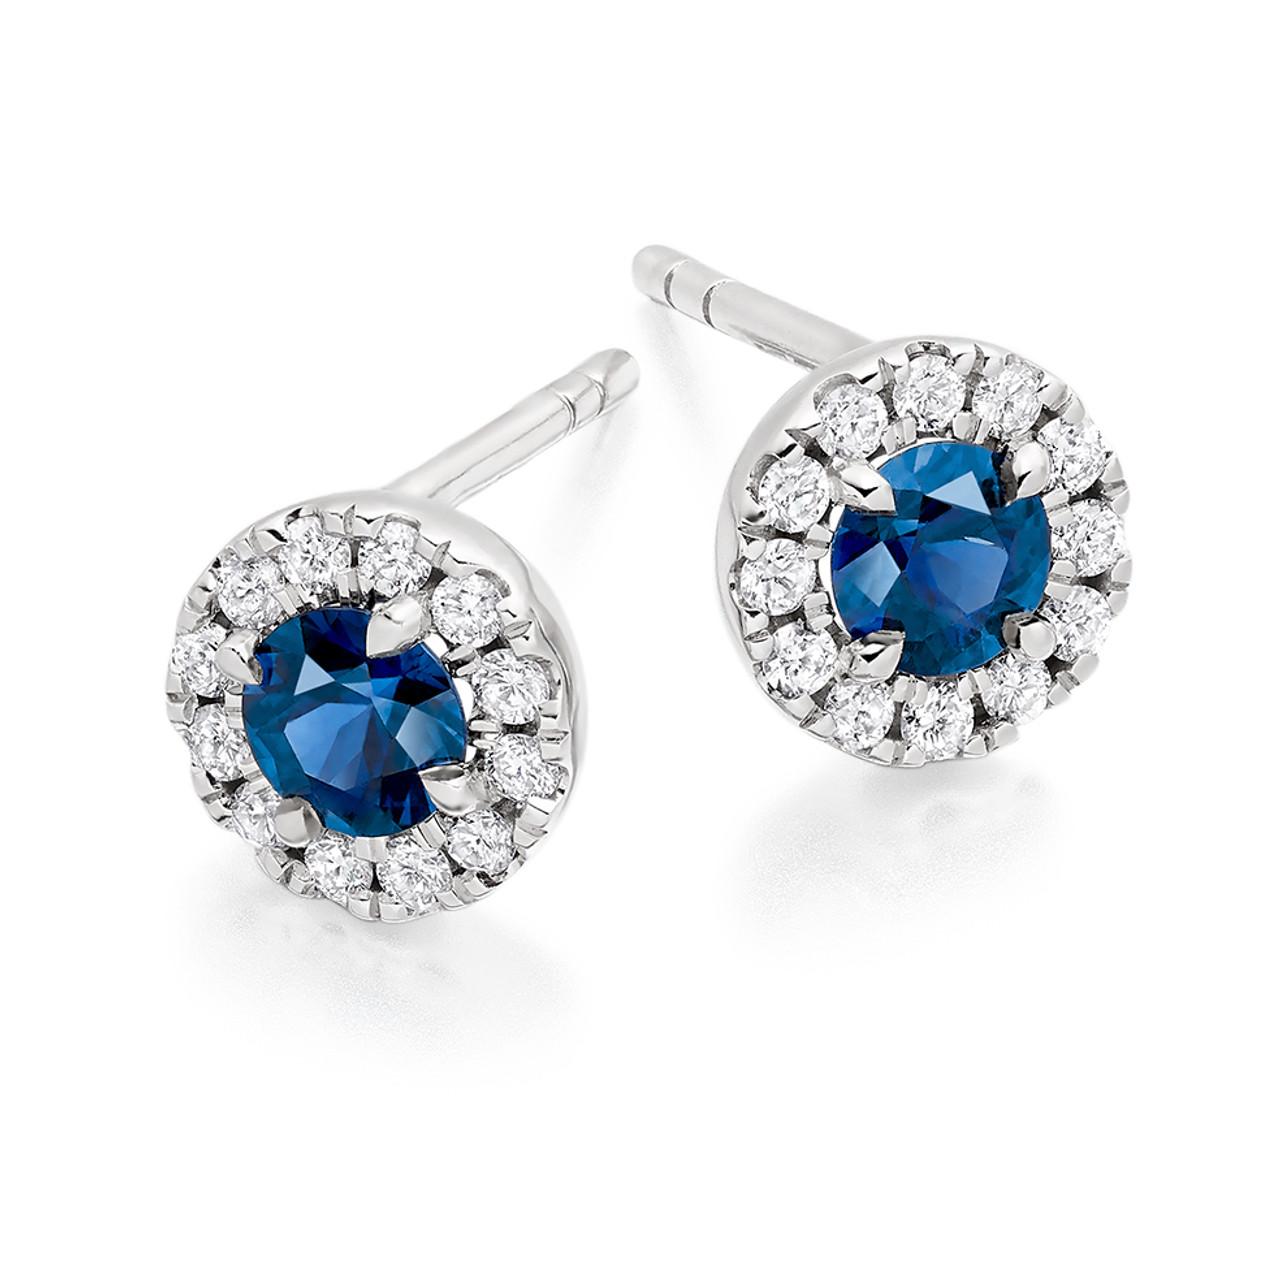 18ct White Gold Sapphire & Diamond Stud Earrings